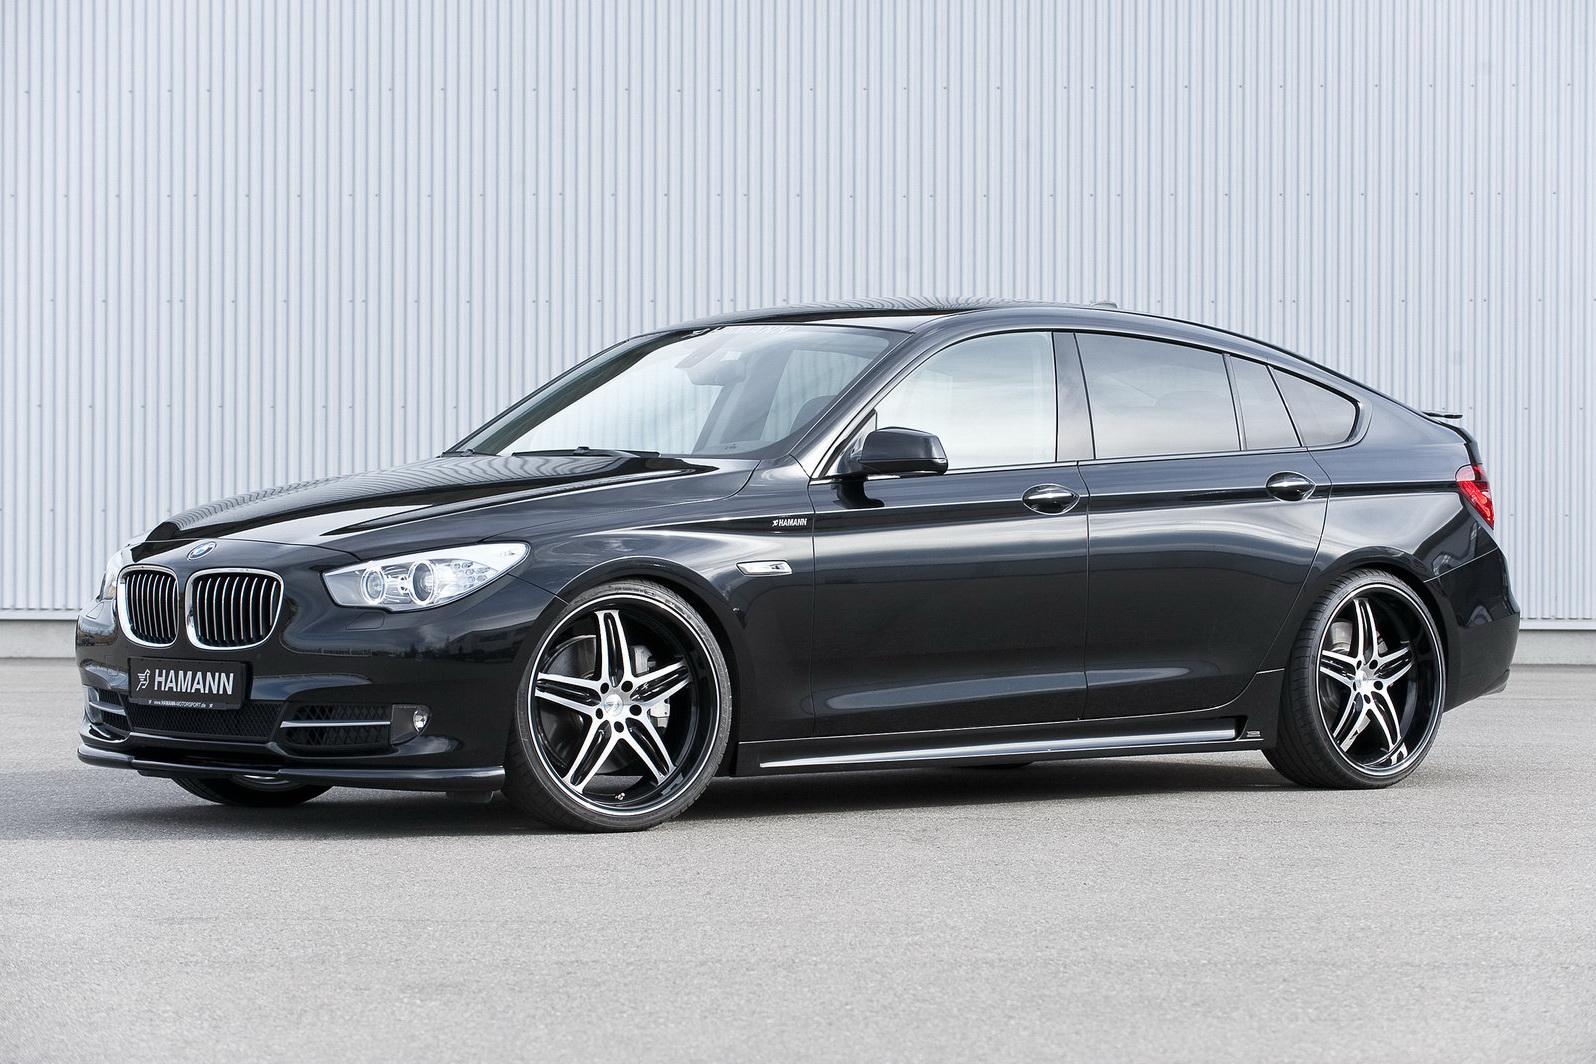 BMW-5-GT-Hamann-23